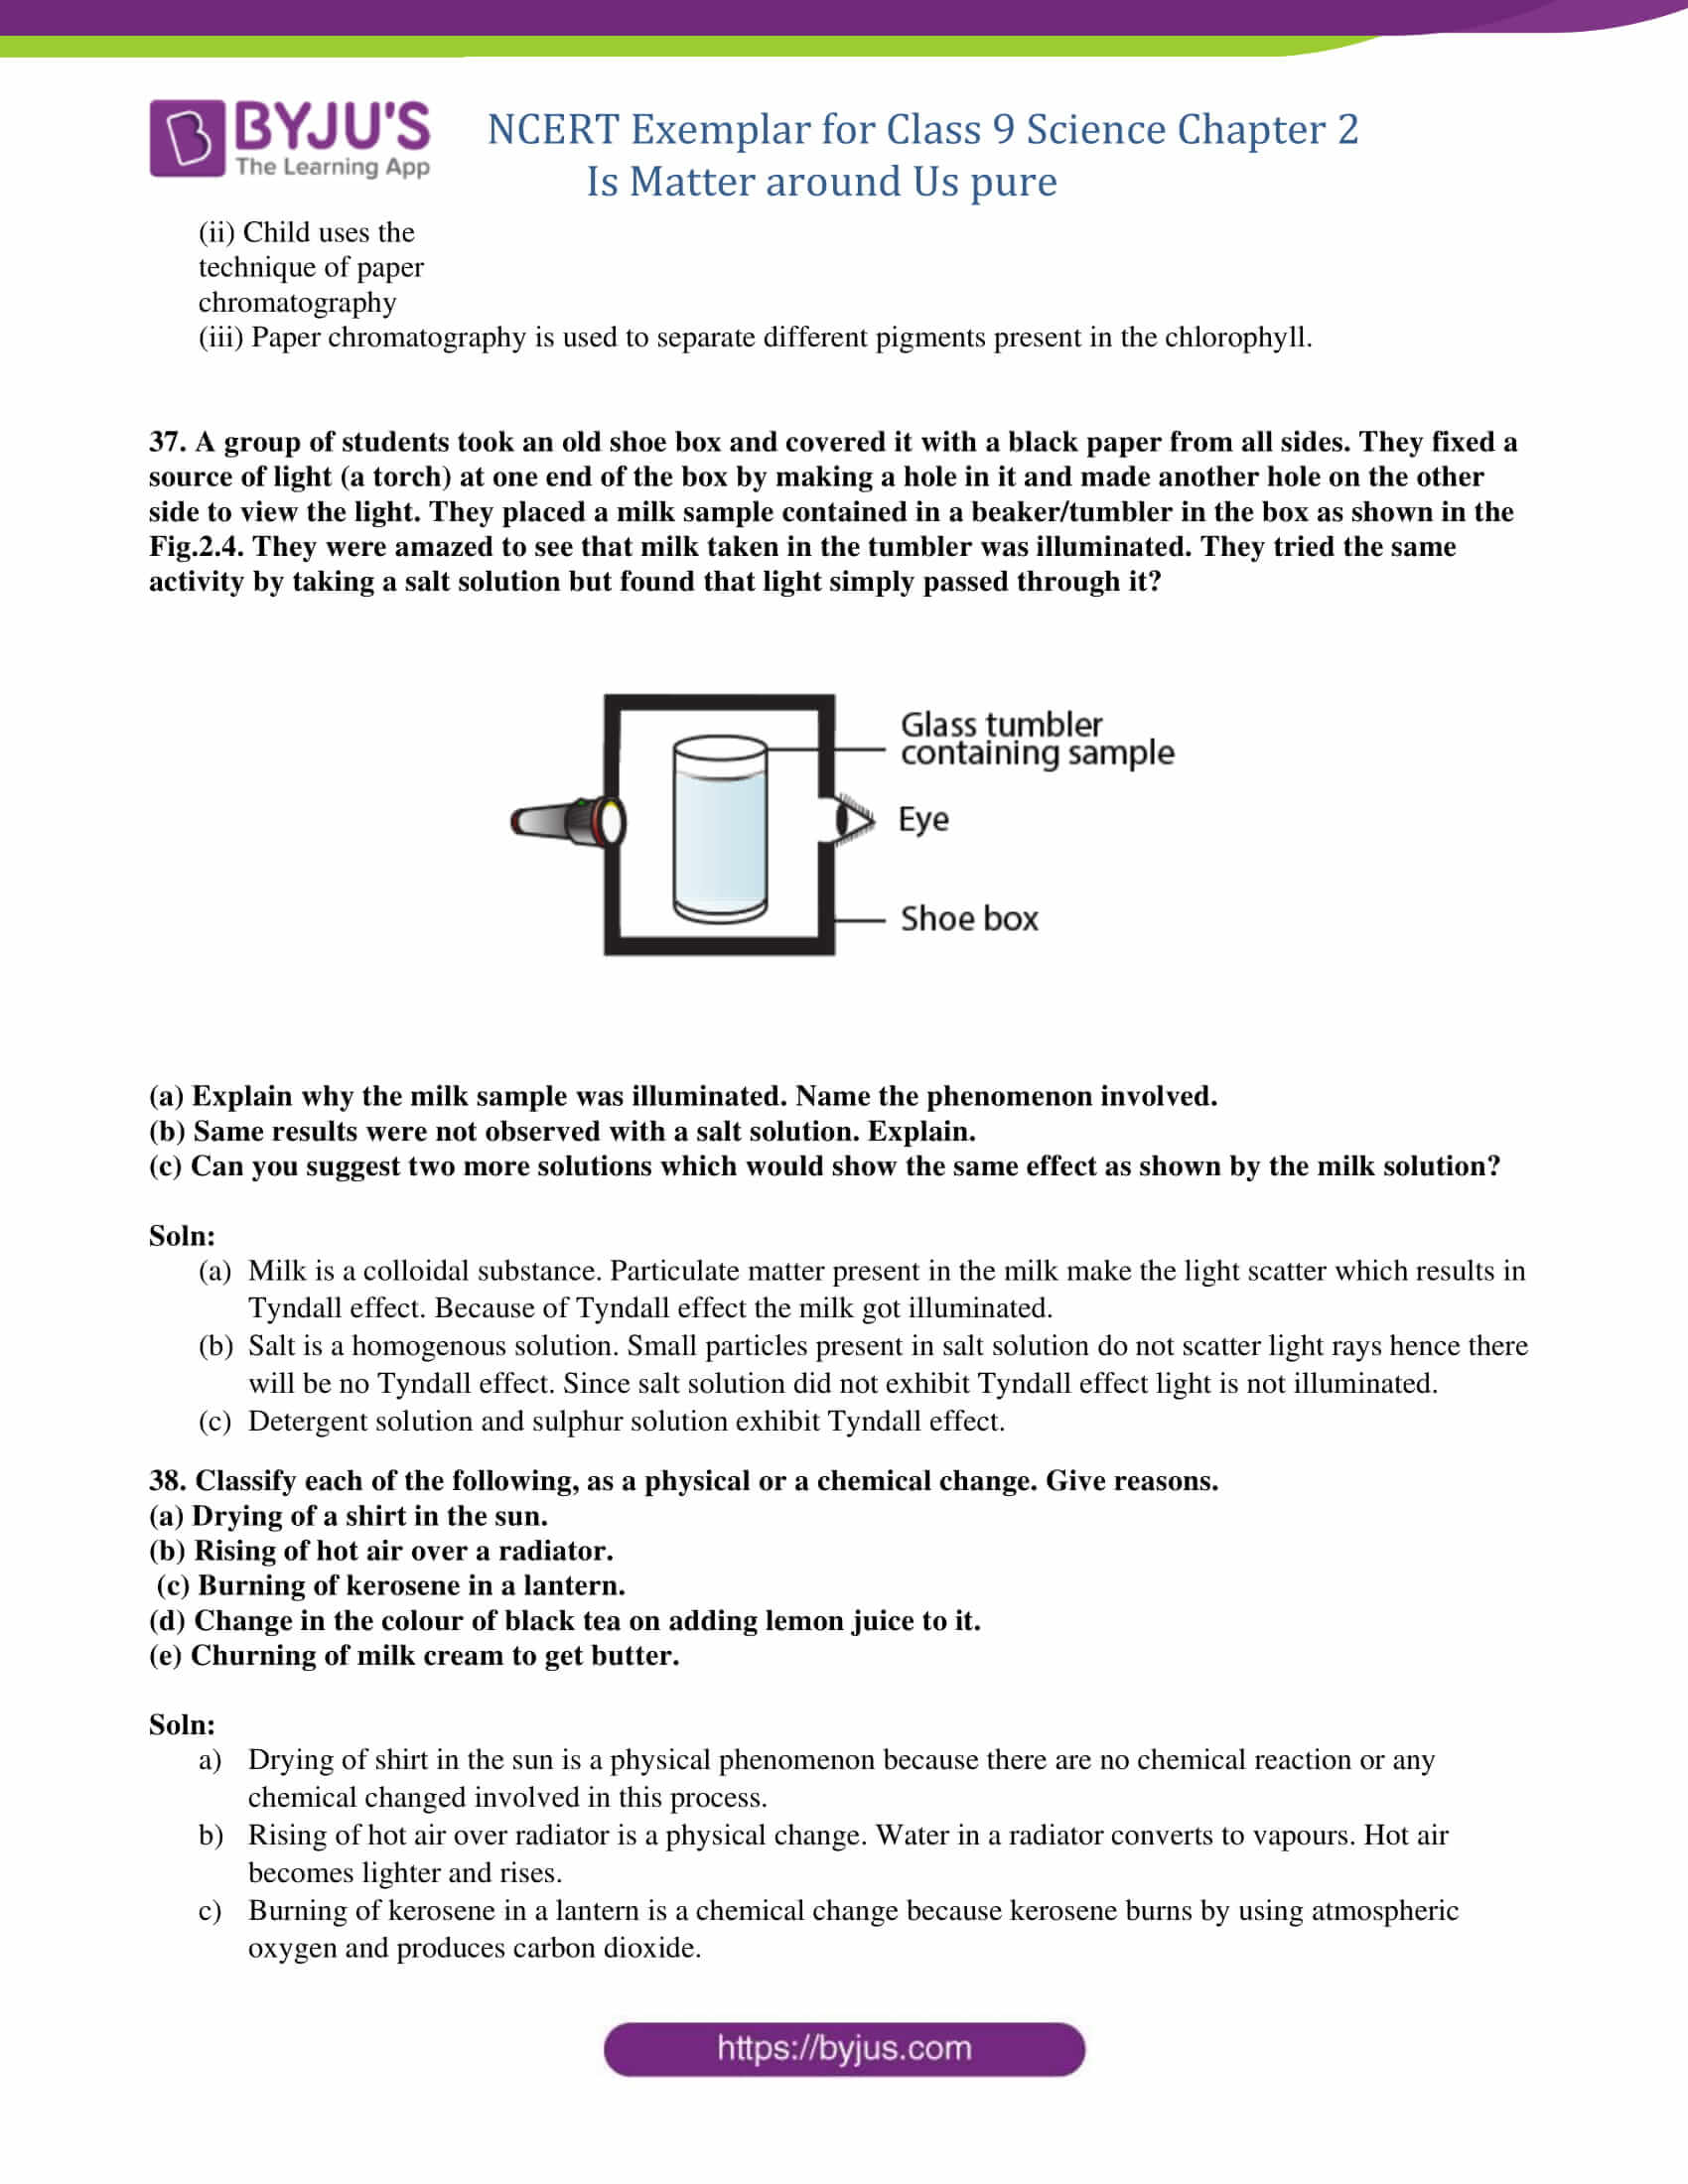 NCERT Exemplar Class 9 Science Solutions Chapter 2 - Is ...